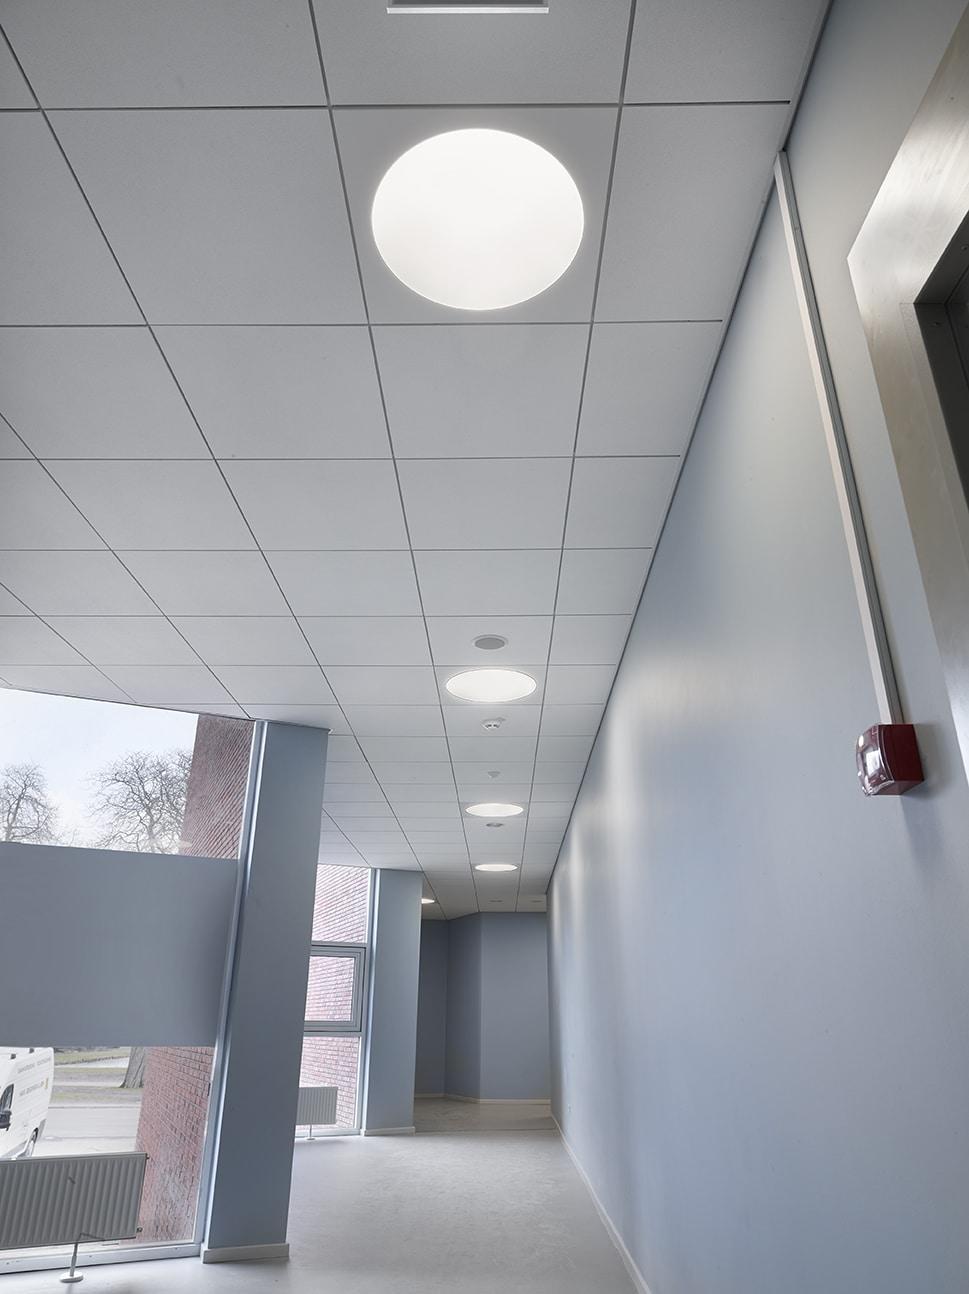 Ledgo circle panel lampe monteret i gips loft i gang hos Odense Katedralskole - Luminex